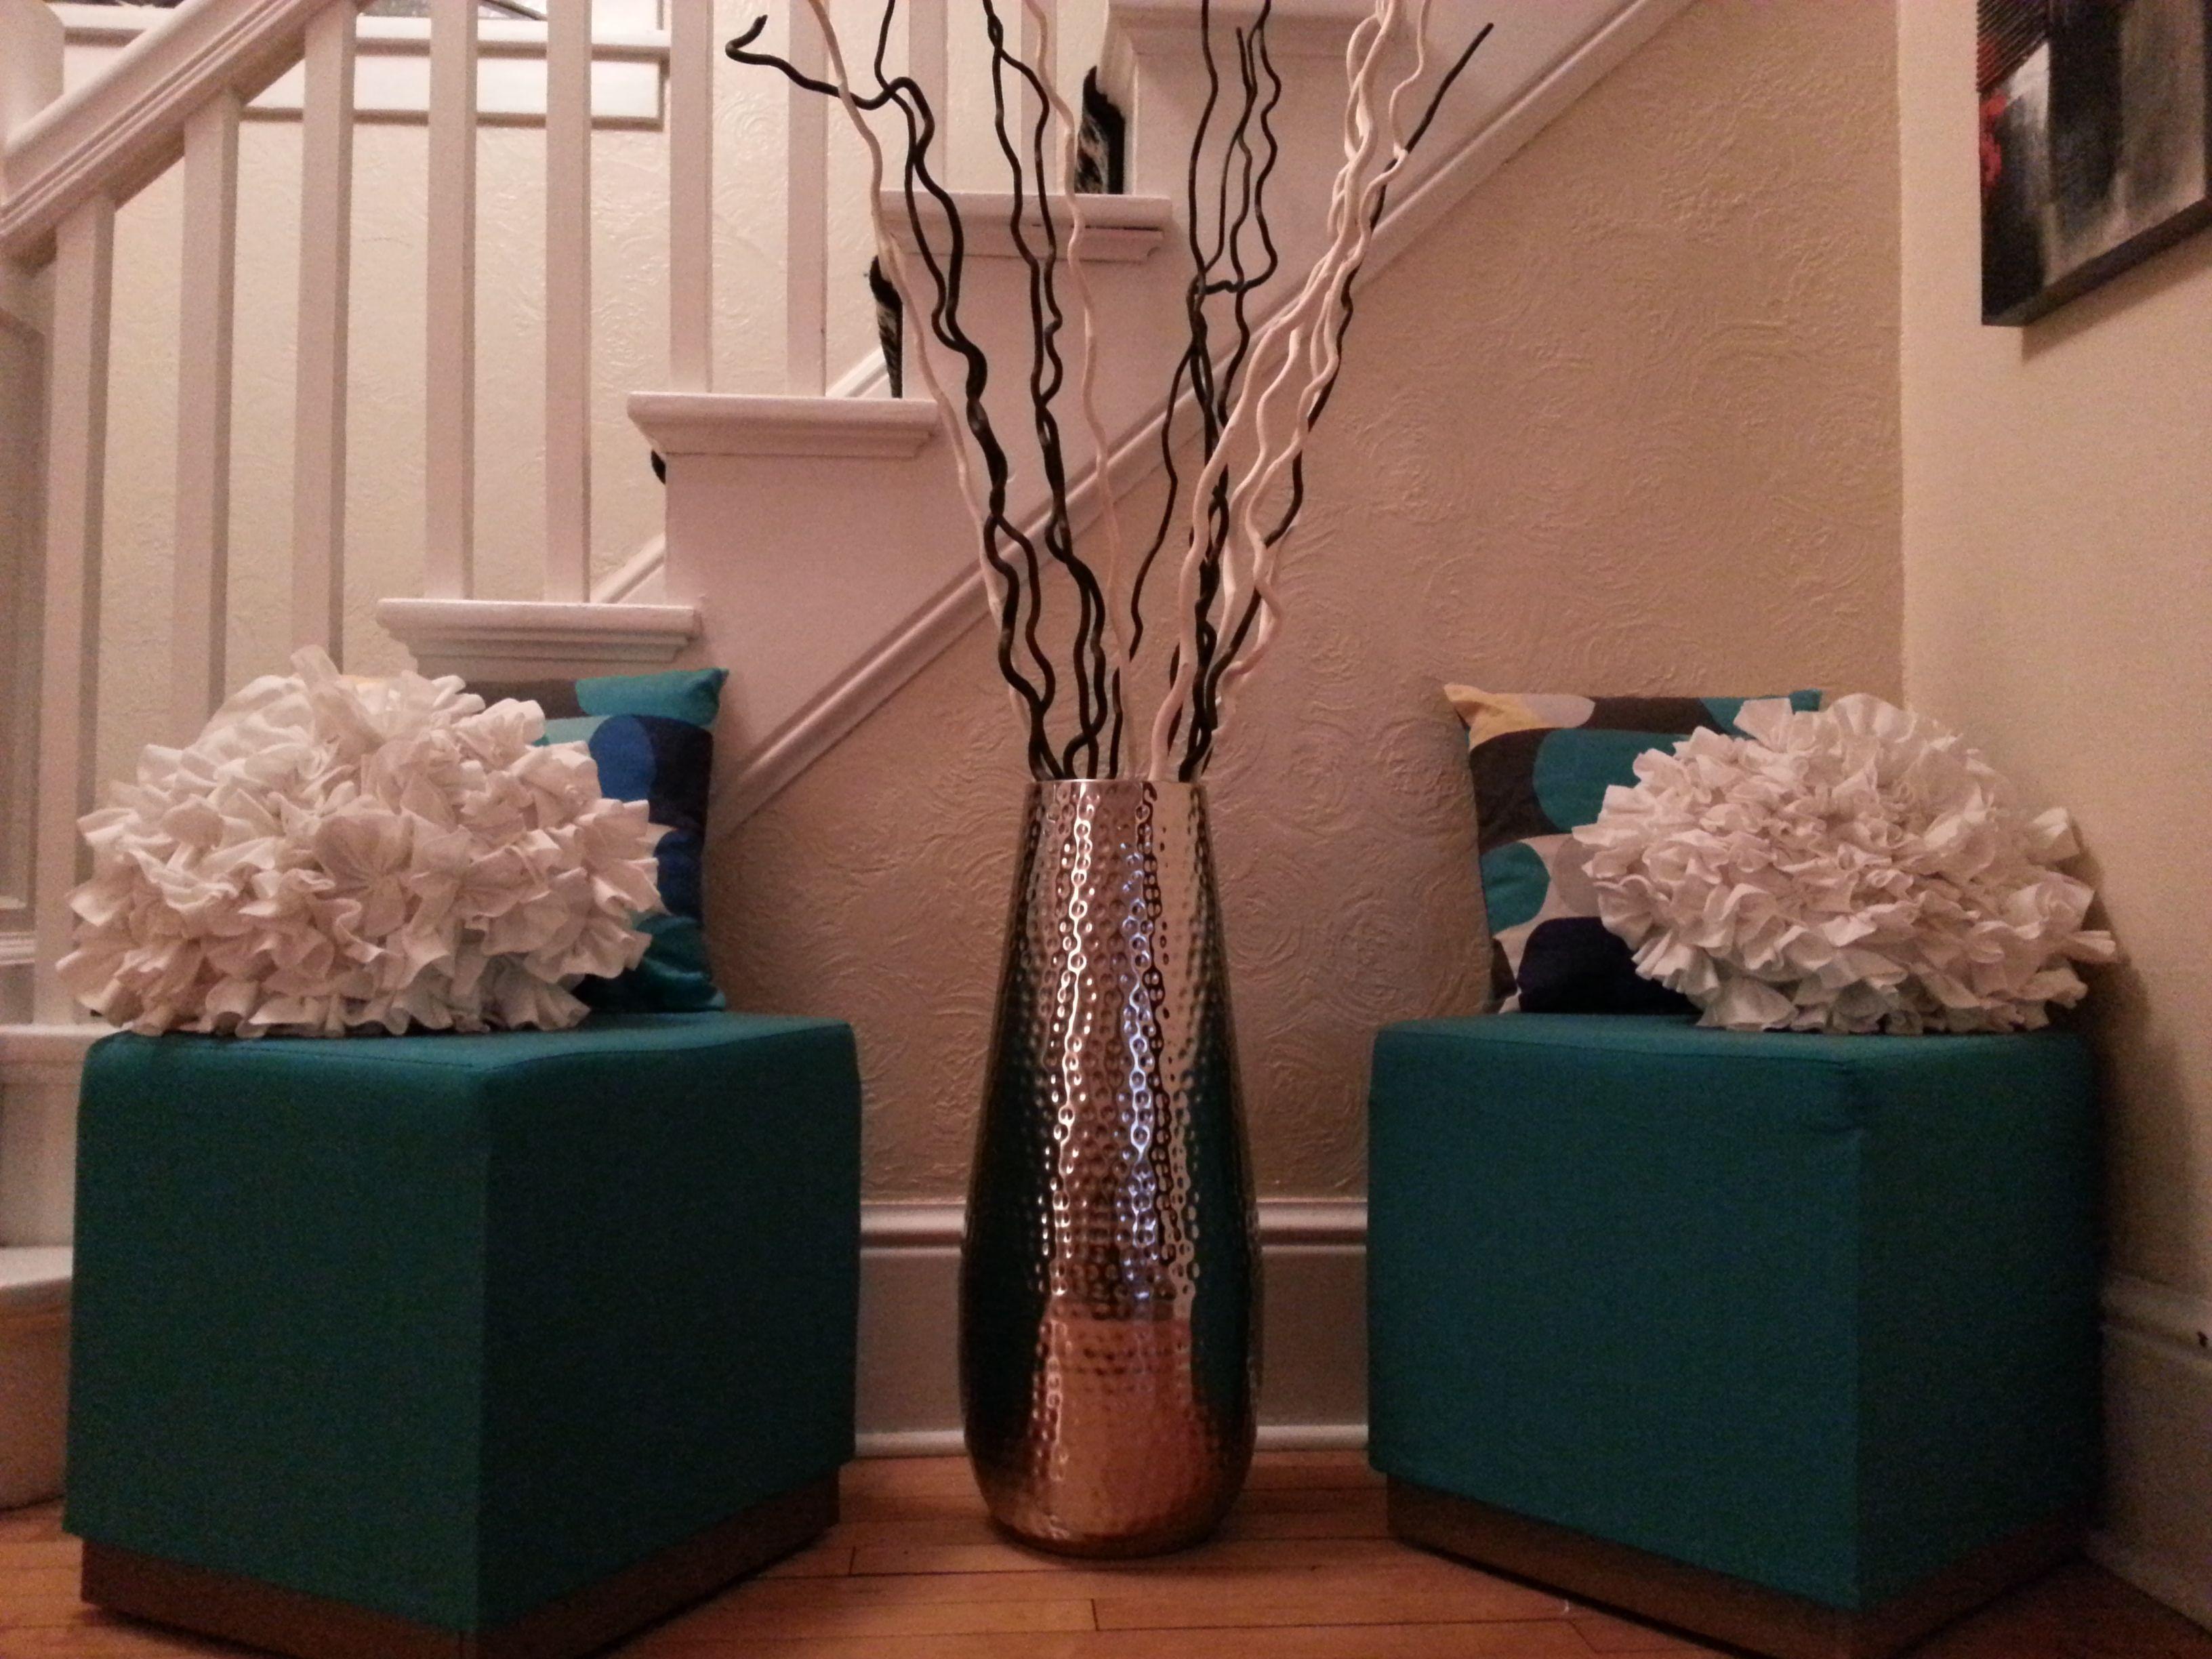 Shiny Large Vases For Living Room Fantastic Large Vases For Living Room 54 For Living Room In Contemporary Living Room Design Beautiful Living Rooms Diy Vase